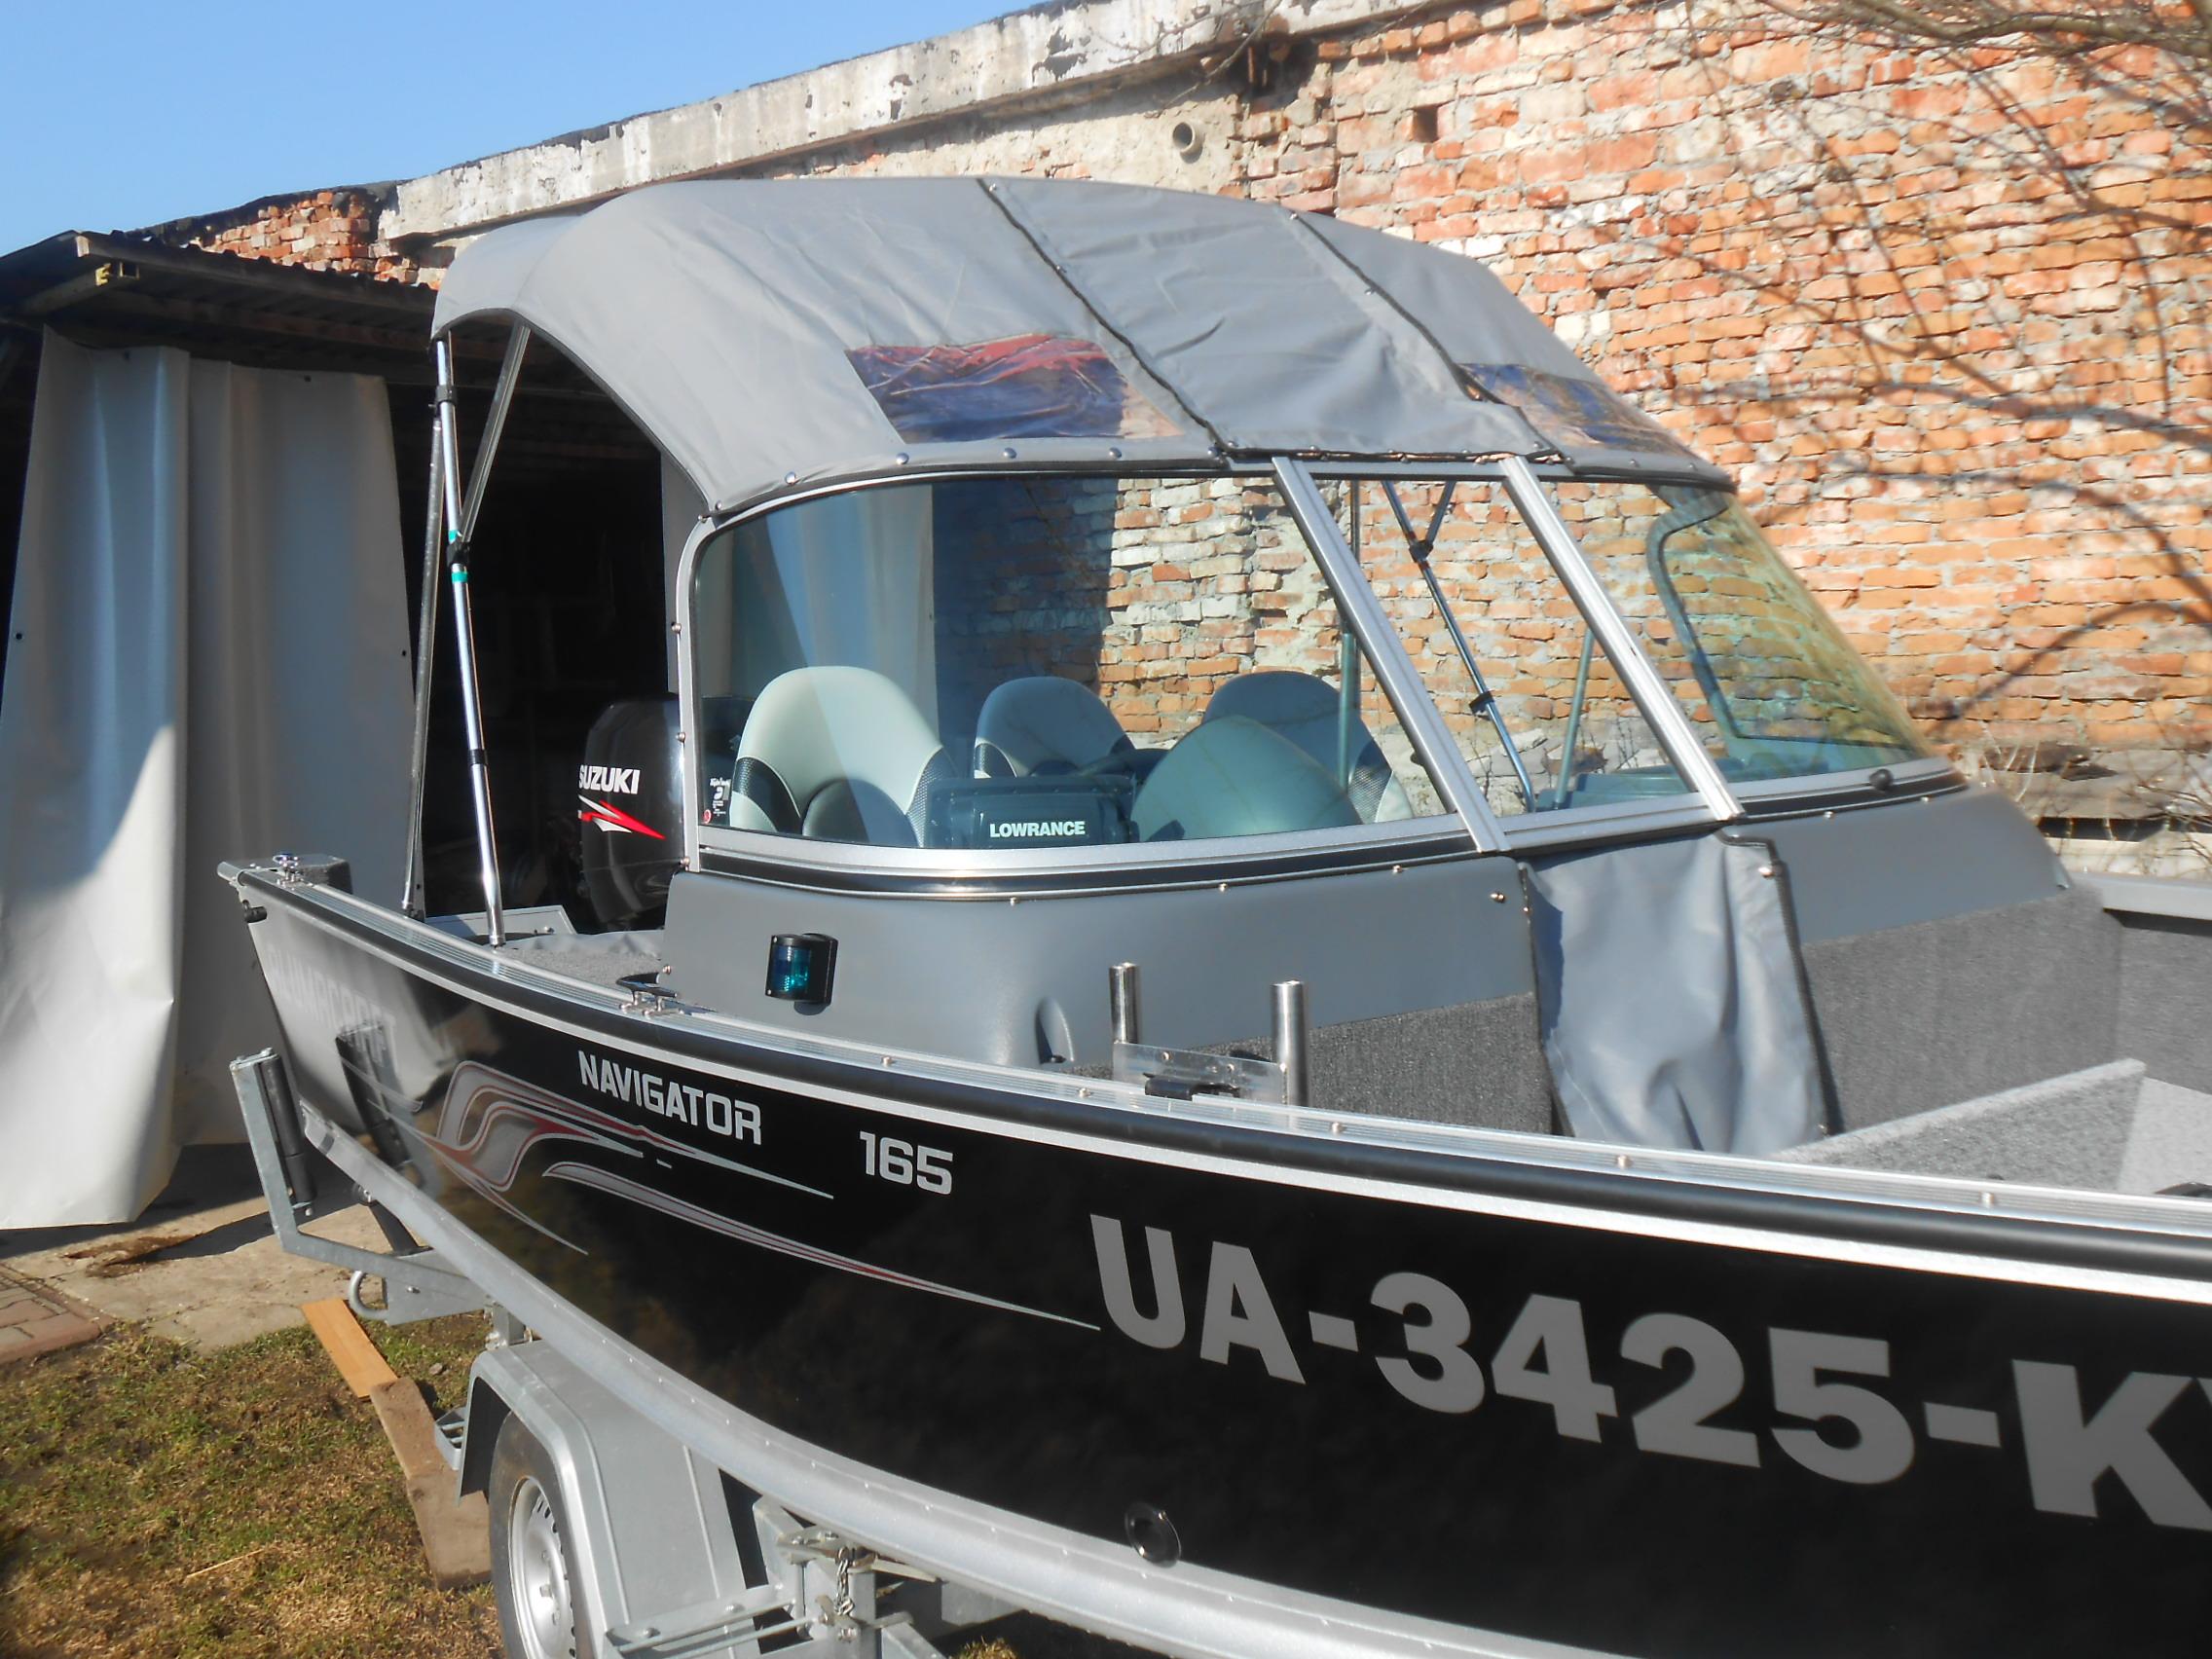 купить лодку катер б у в саратове